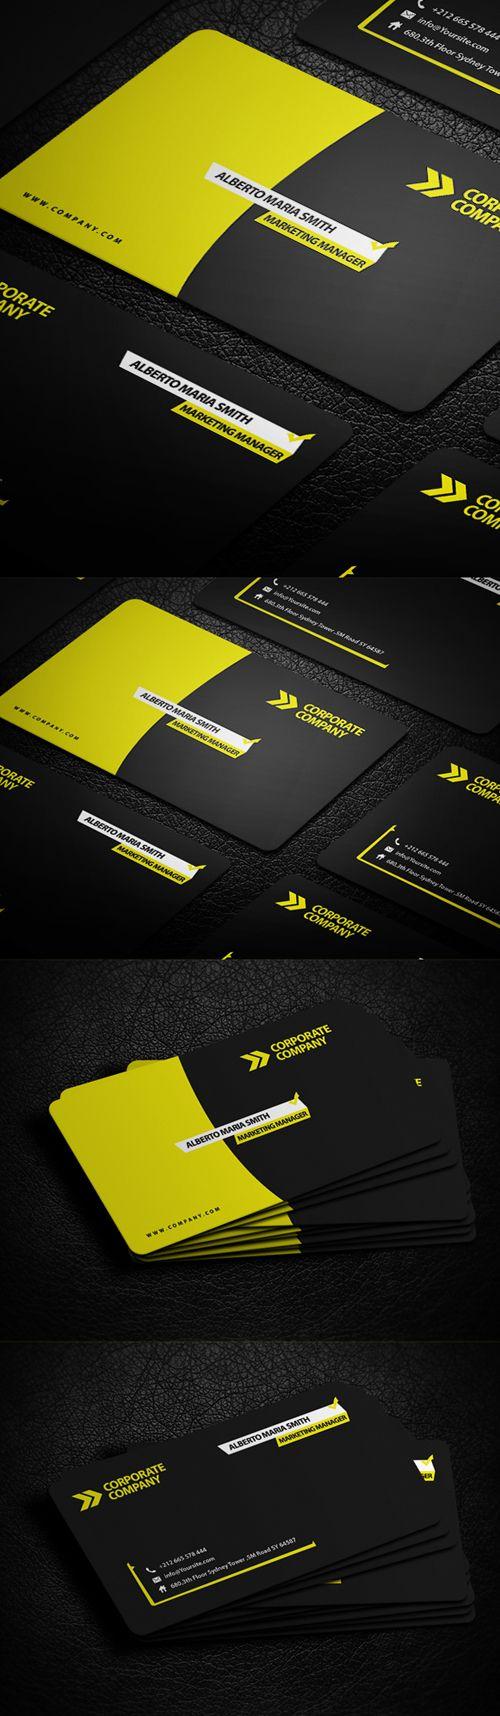 business cards template design - 11 #businesscards #businesscardtemplates #creativebusinesscards